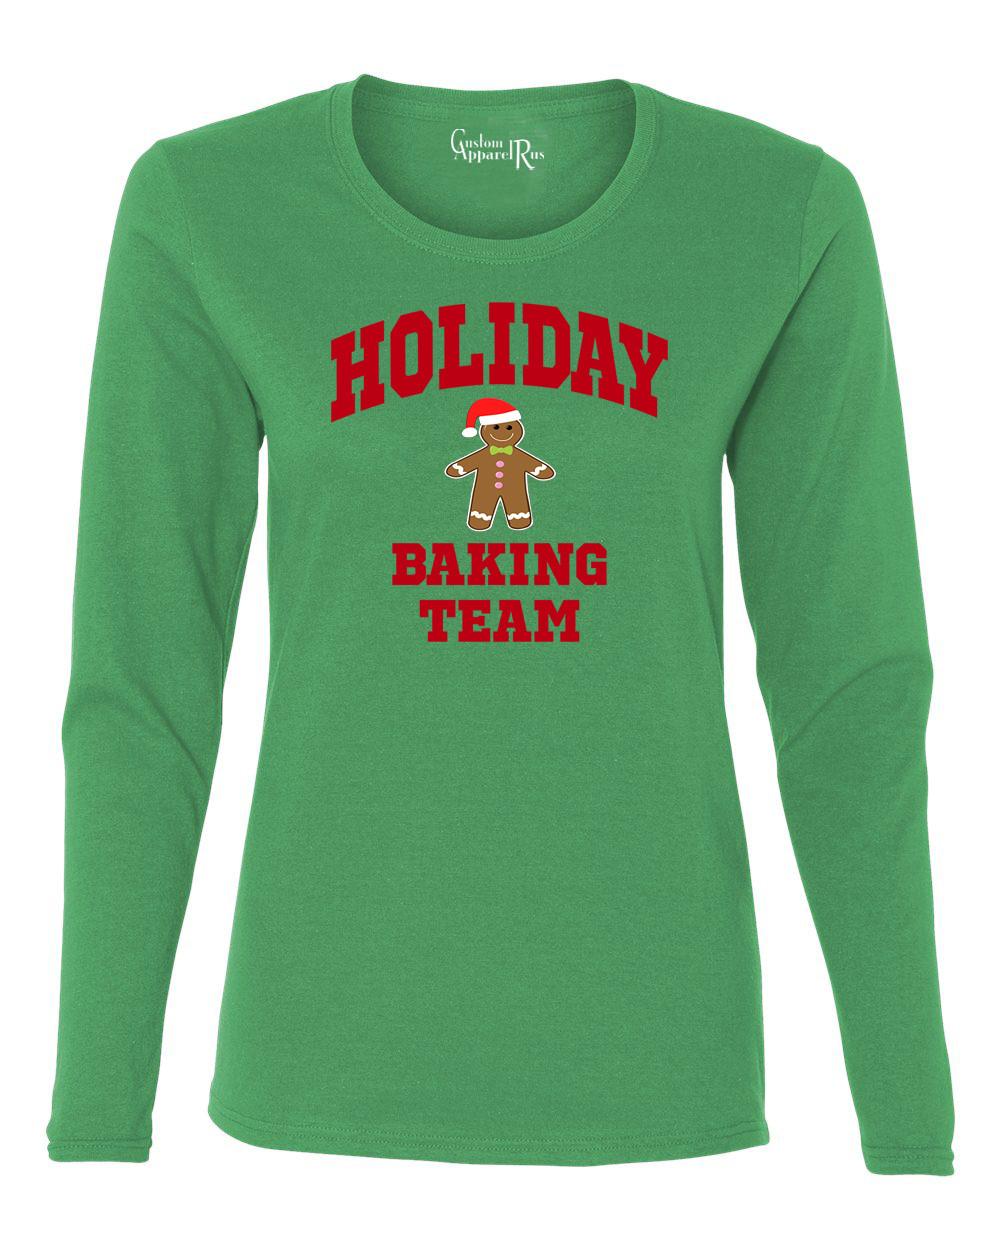 Christmas Baking Shirts  Holiday Baking Team Christmas Cookies Womens Long Sleeve T